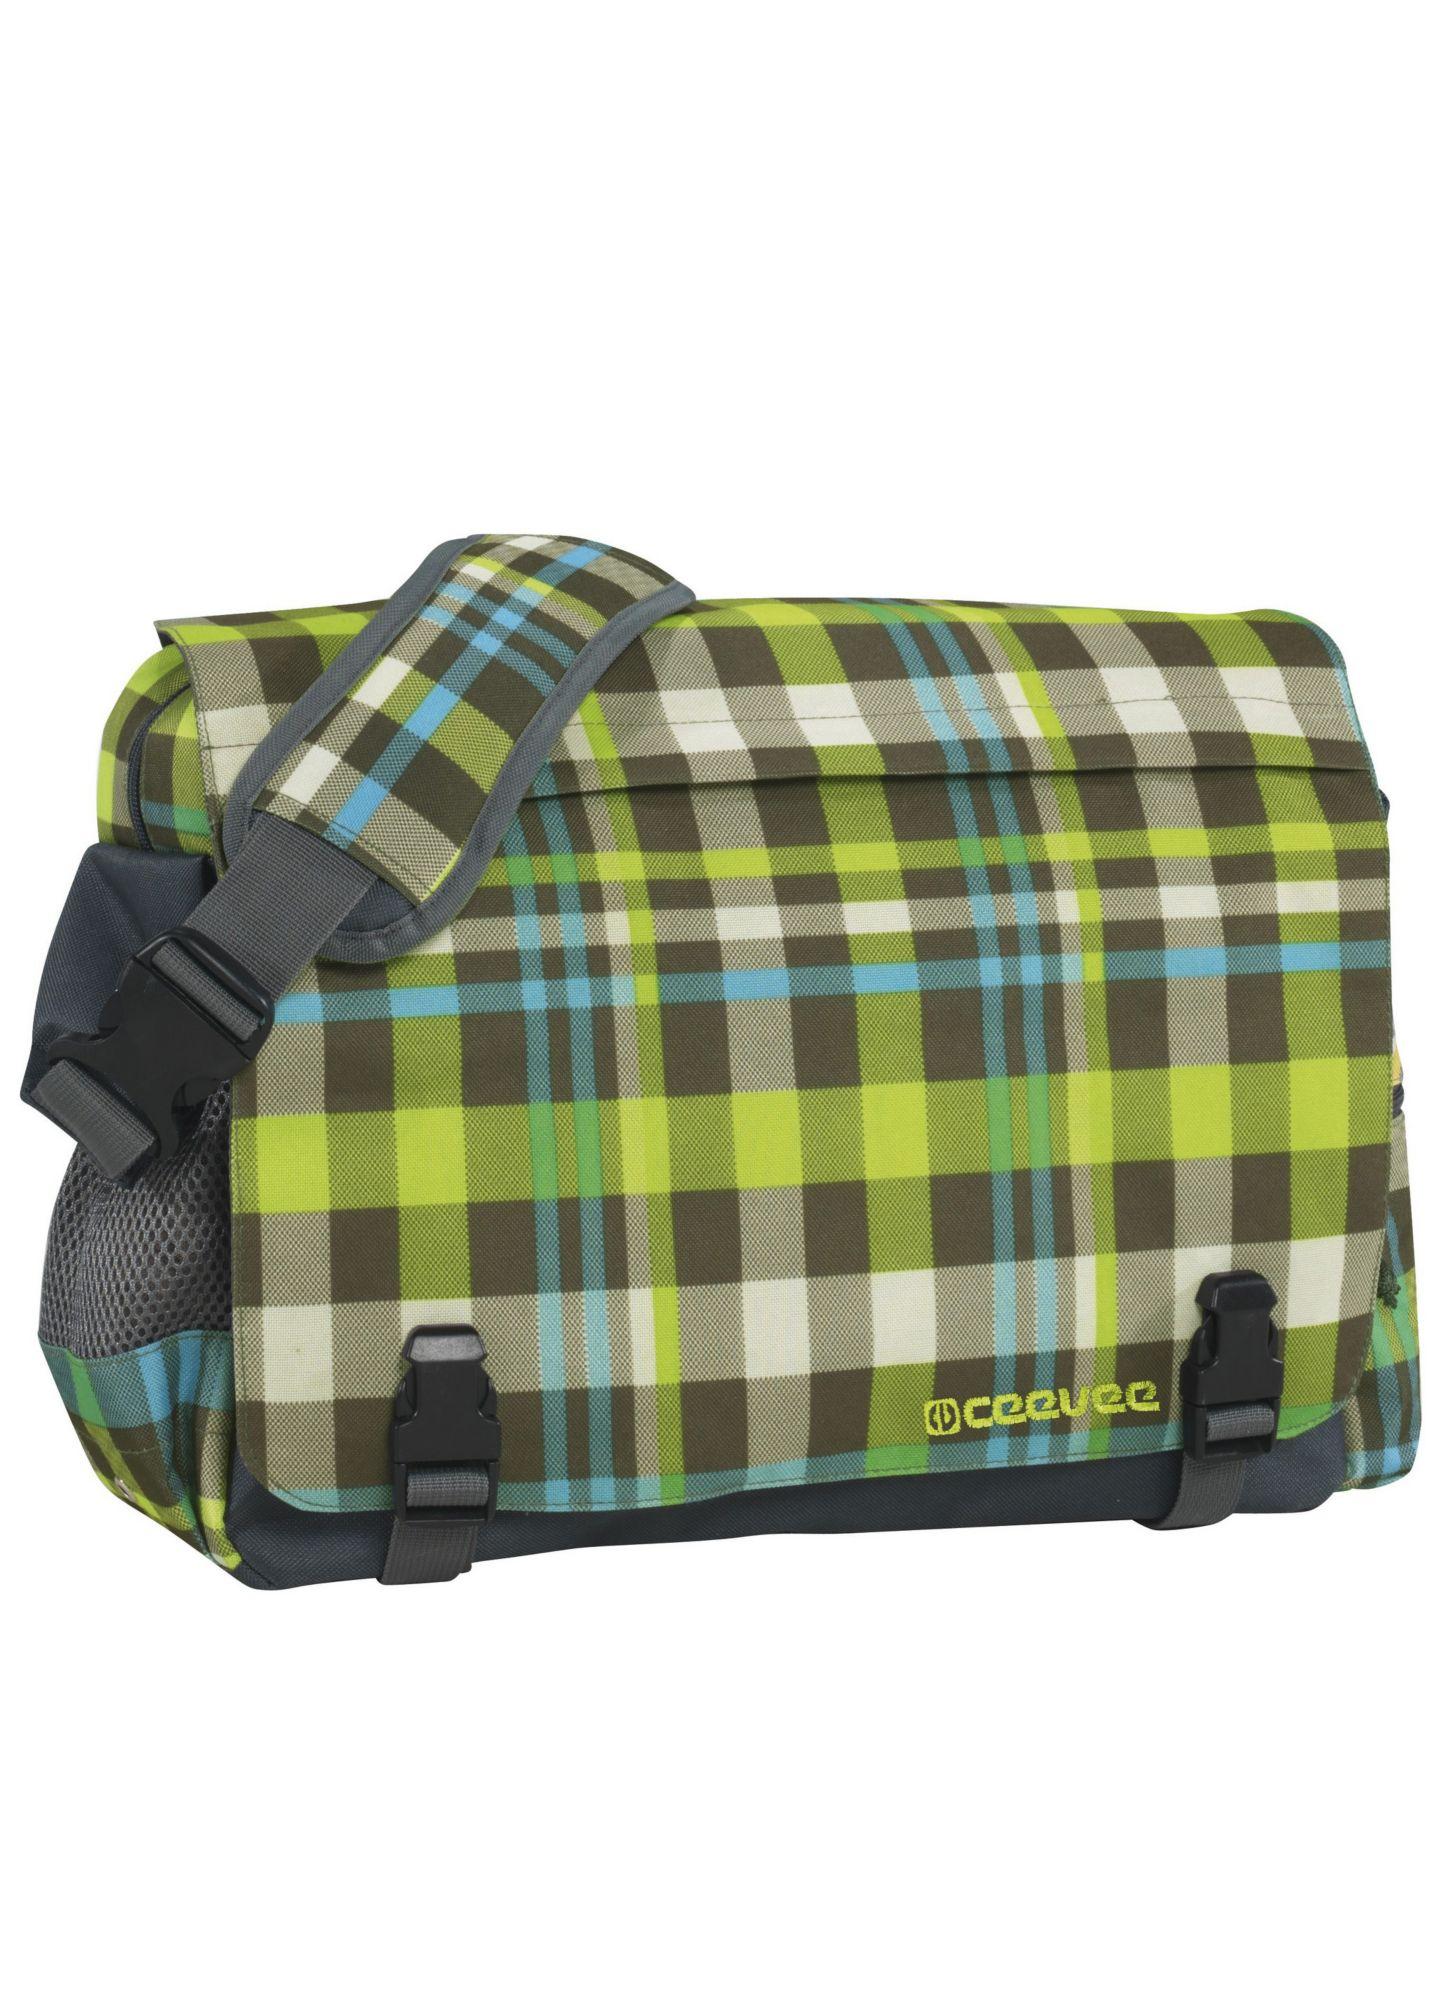 CEEVEE® ceevee® Messenger Bag, »Manchester caro green«